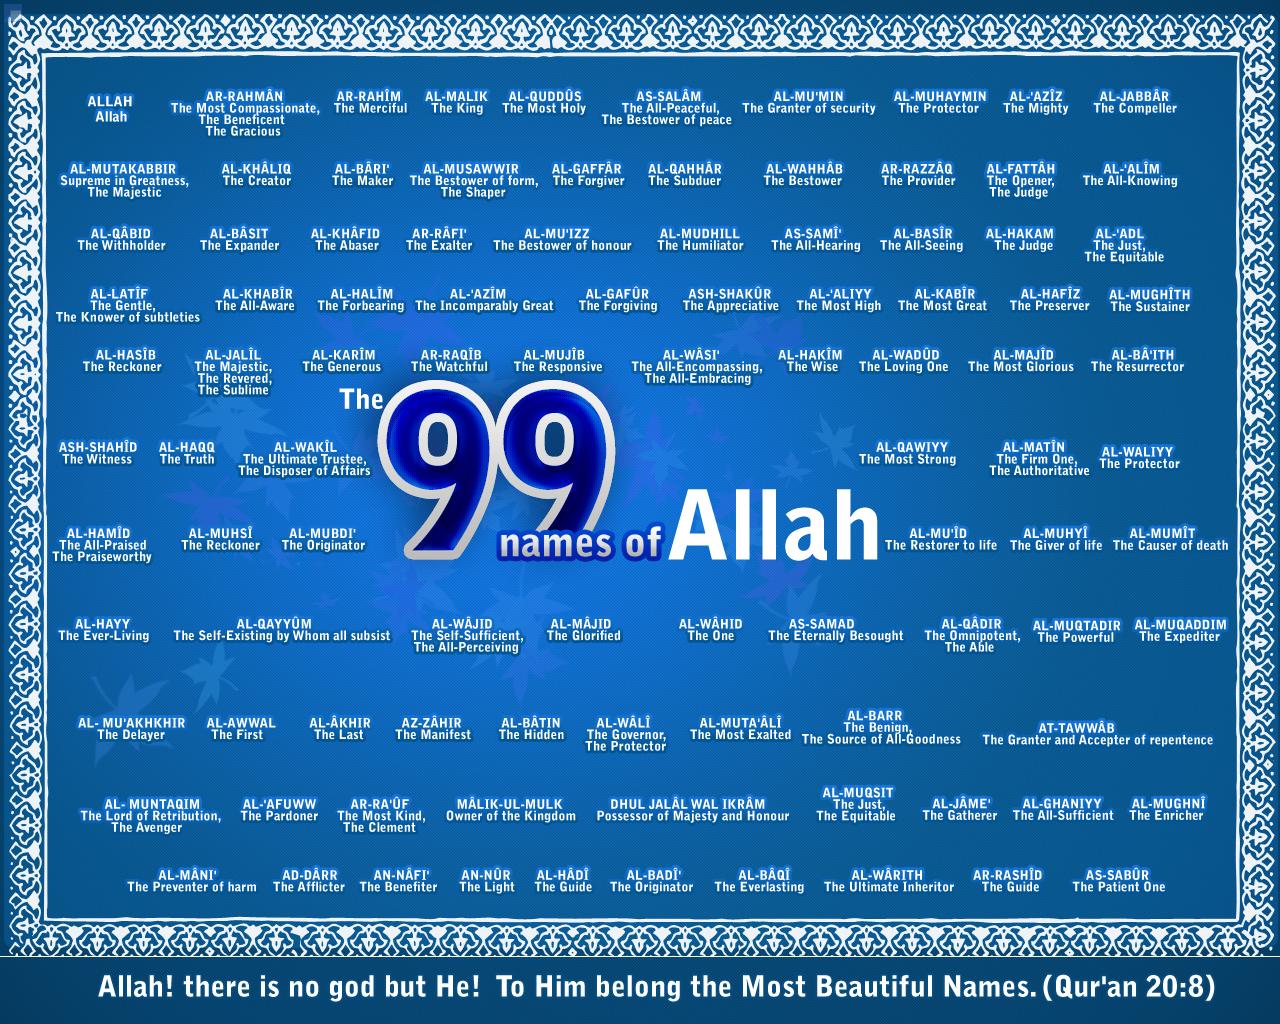 http://2.bp.blogspot.com/-t41KBiPzJtE/TdP5hoqeSrI/AAAAAAAAATo/qOKf6udWs5c/s1600/99+Names+of+Allah+%25282%2529.jpg Allah Names Pictures Free Download